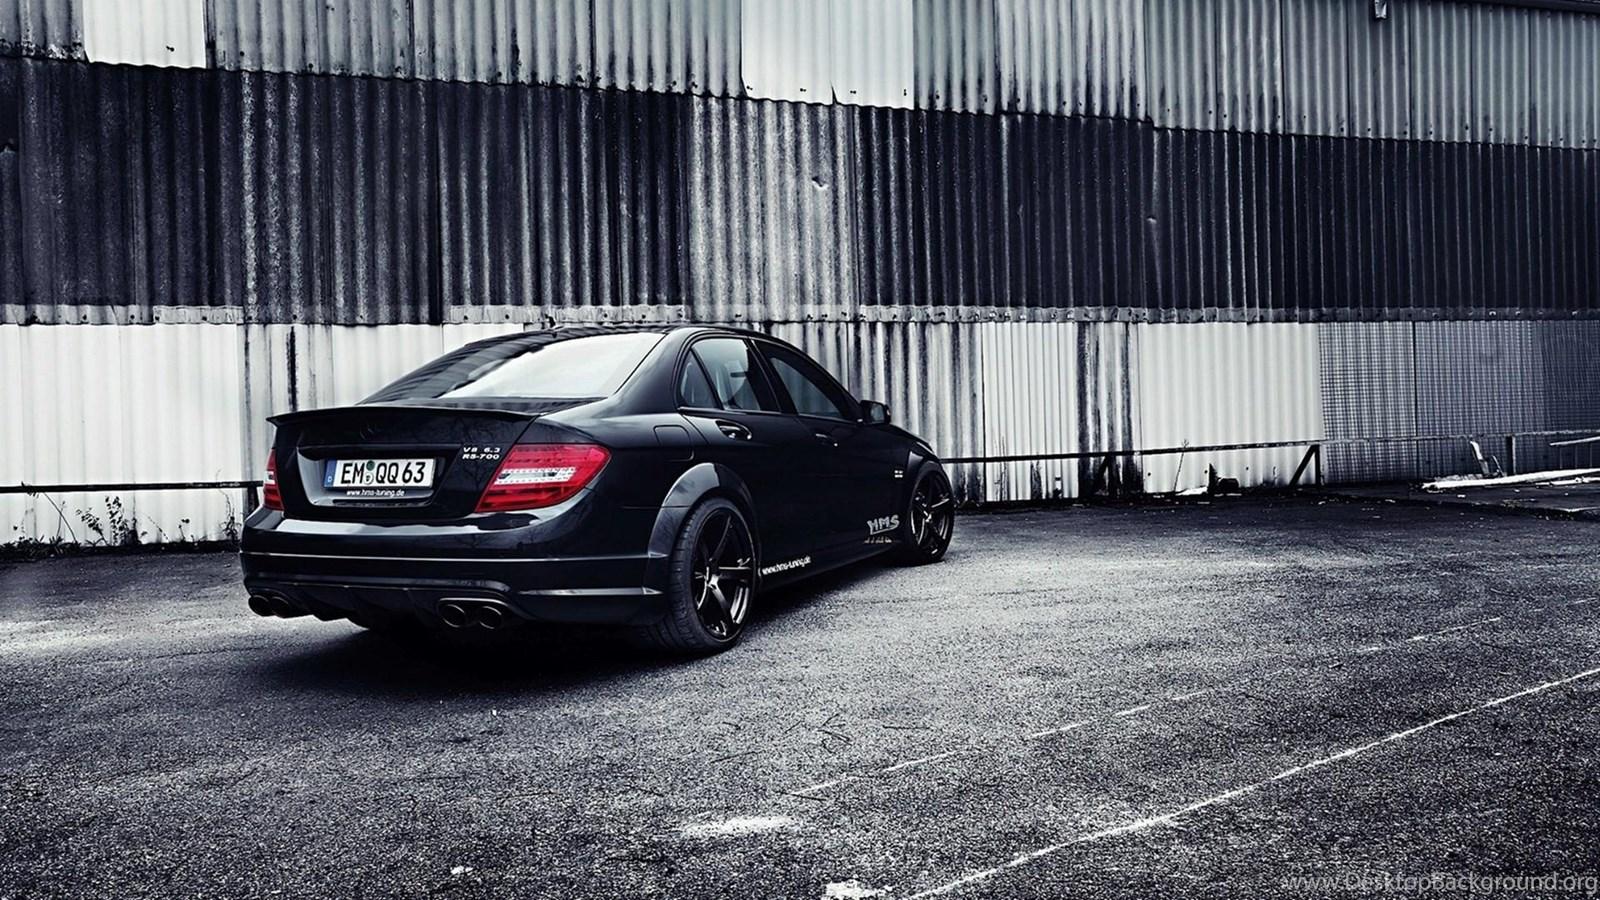 Mercedes Benz C63 Mercedes Benz Black Series Amg Wallpapers Desktop